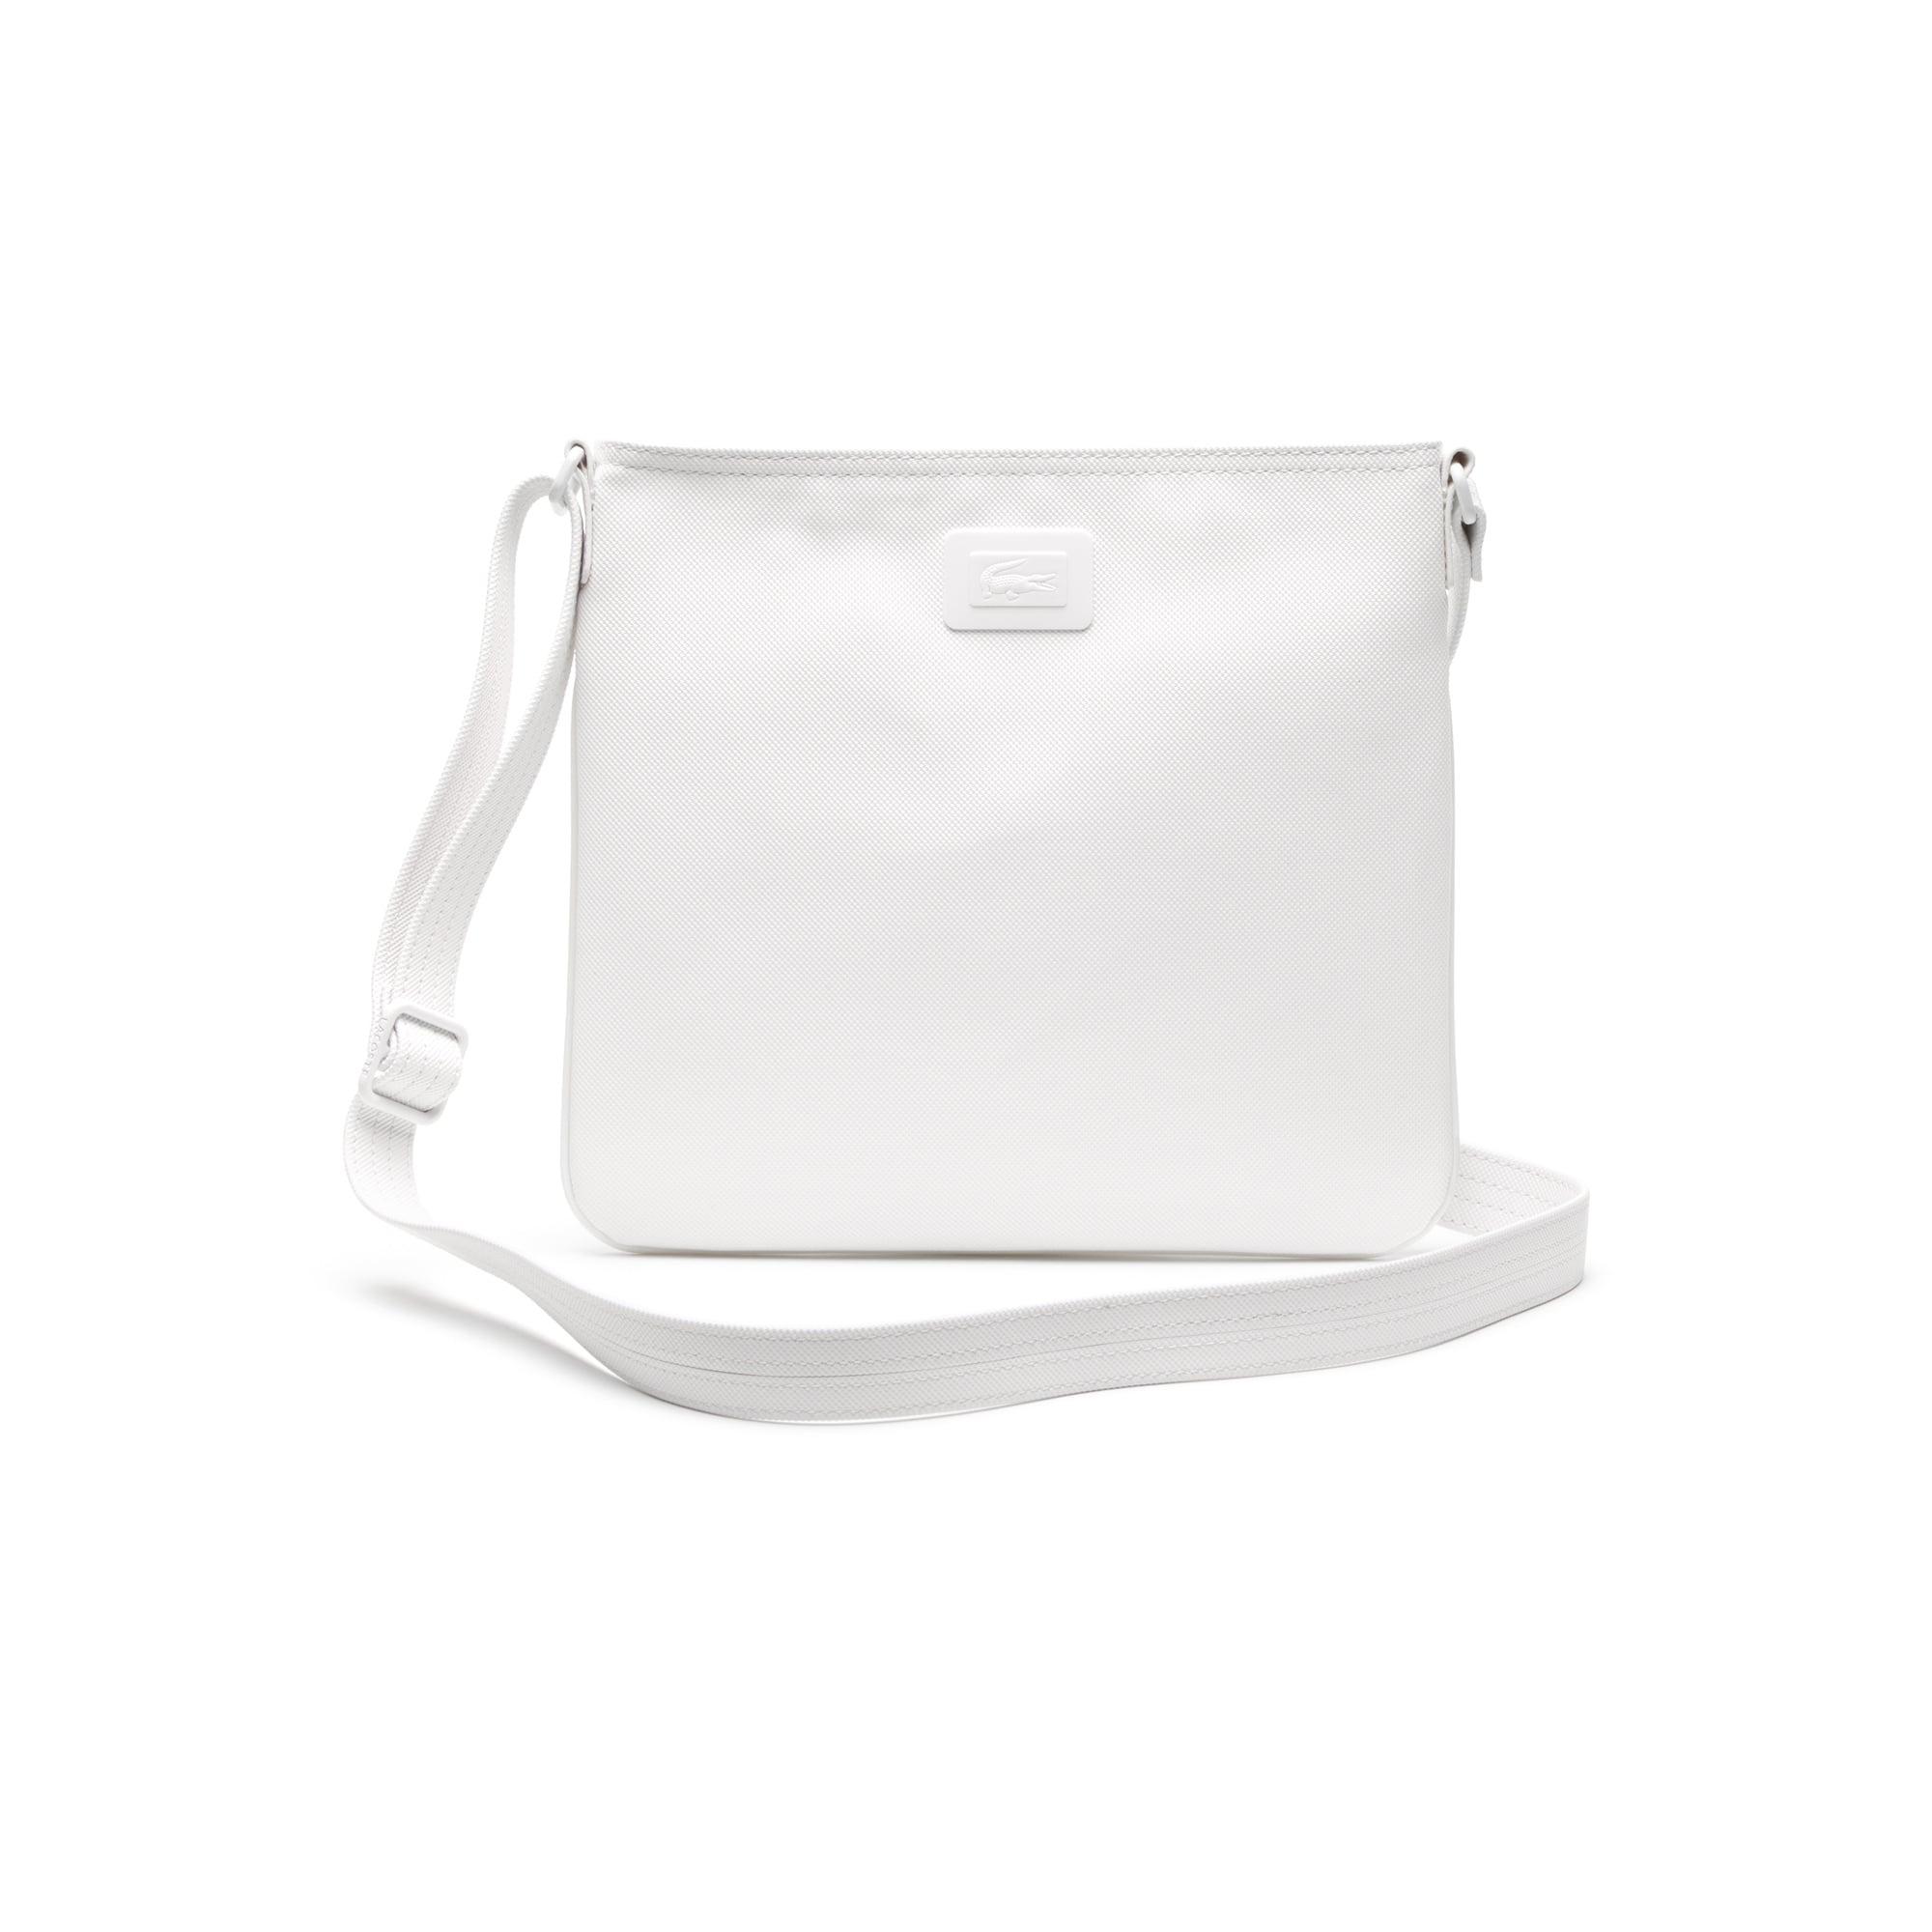 Bolsa tiracolo WOMEN'S CLASSIC plana